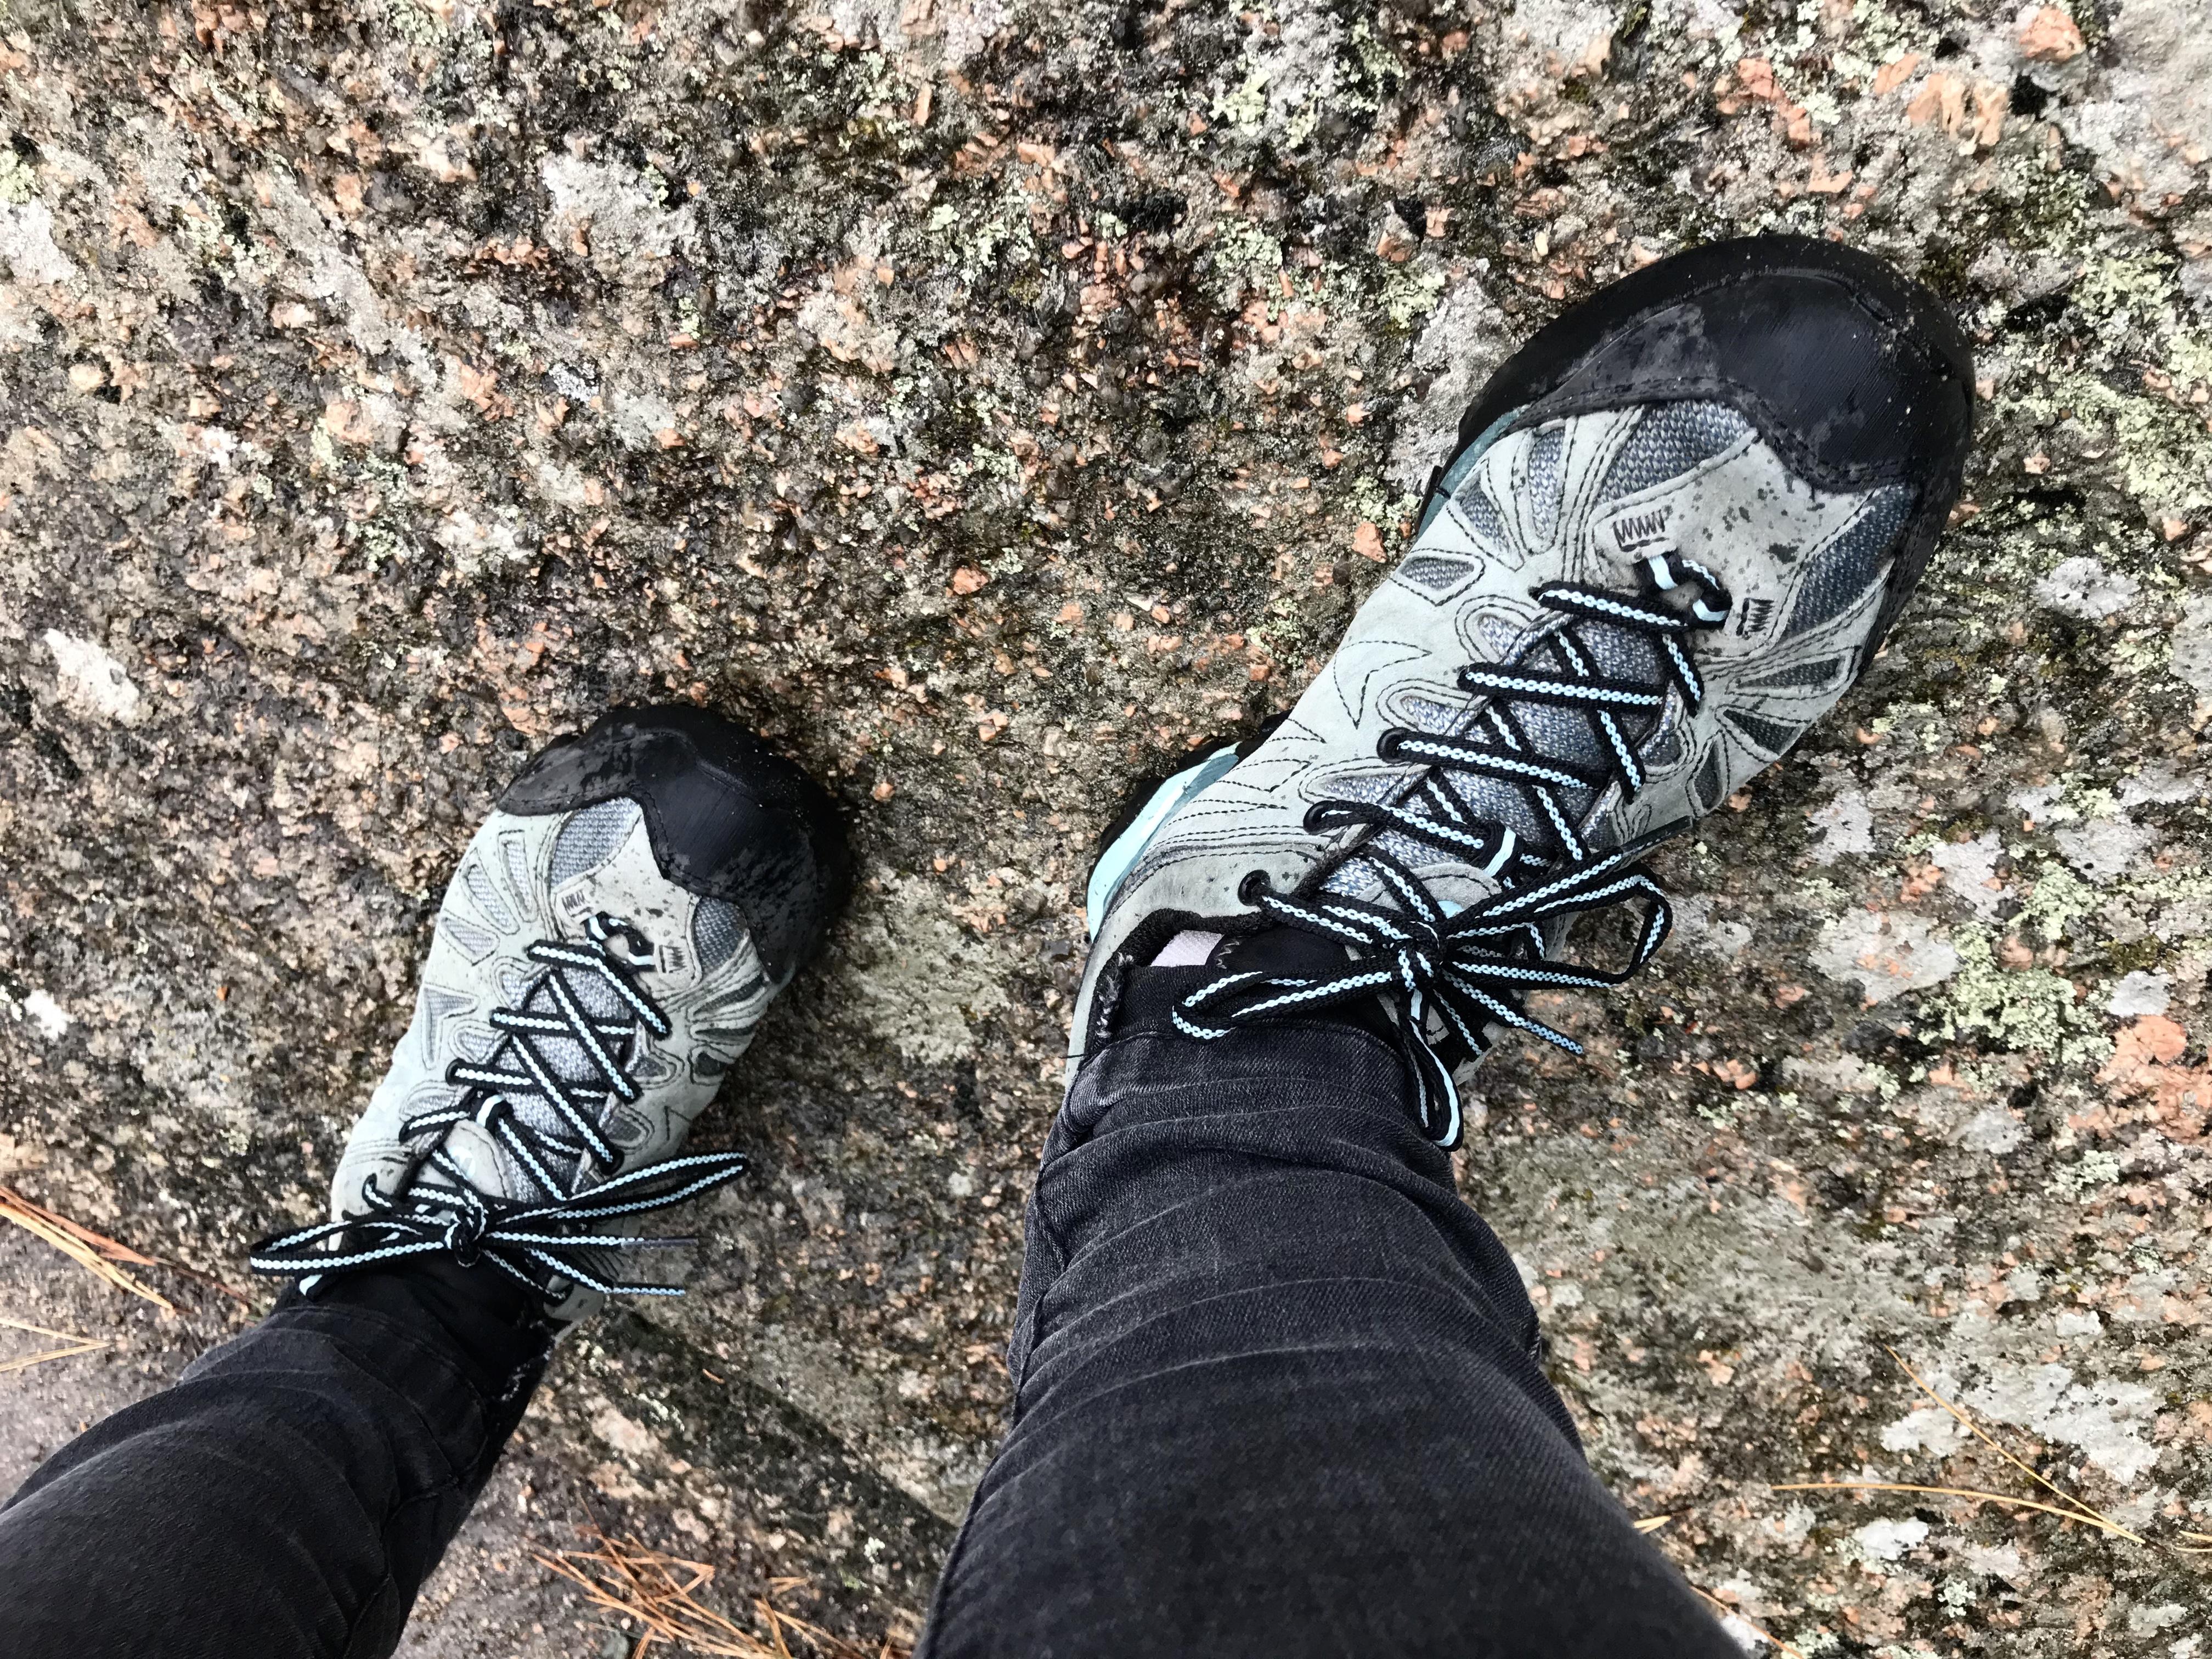 website for discount how to buy check out I TEST I Chaussures de randonnée MERRELL Capra basses